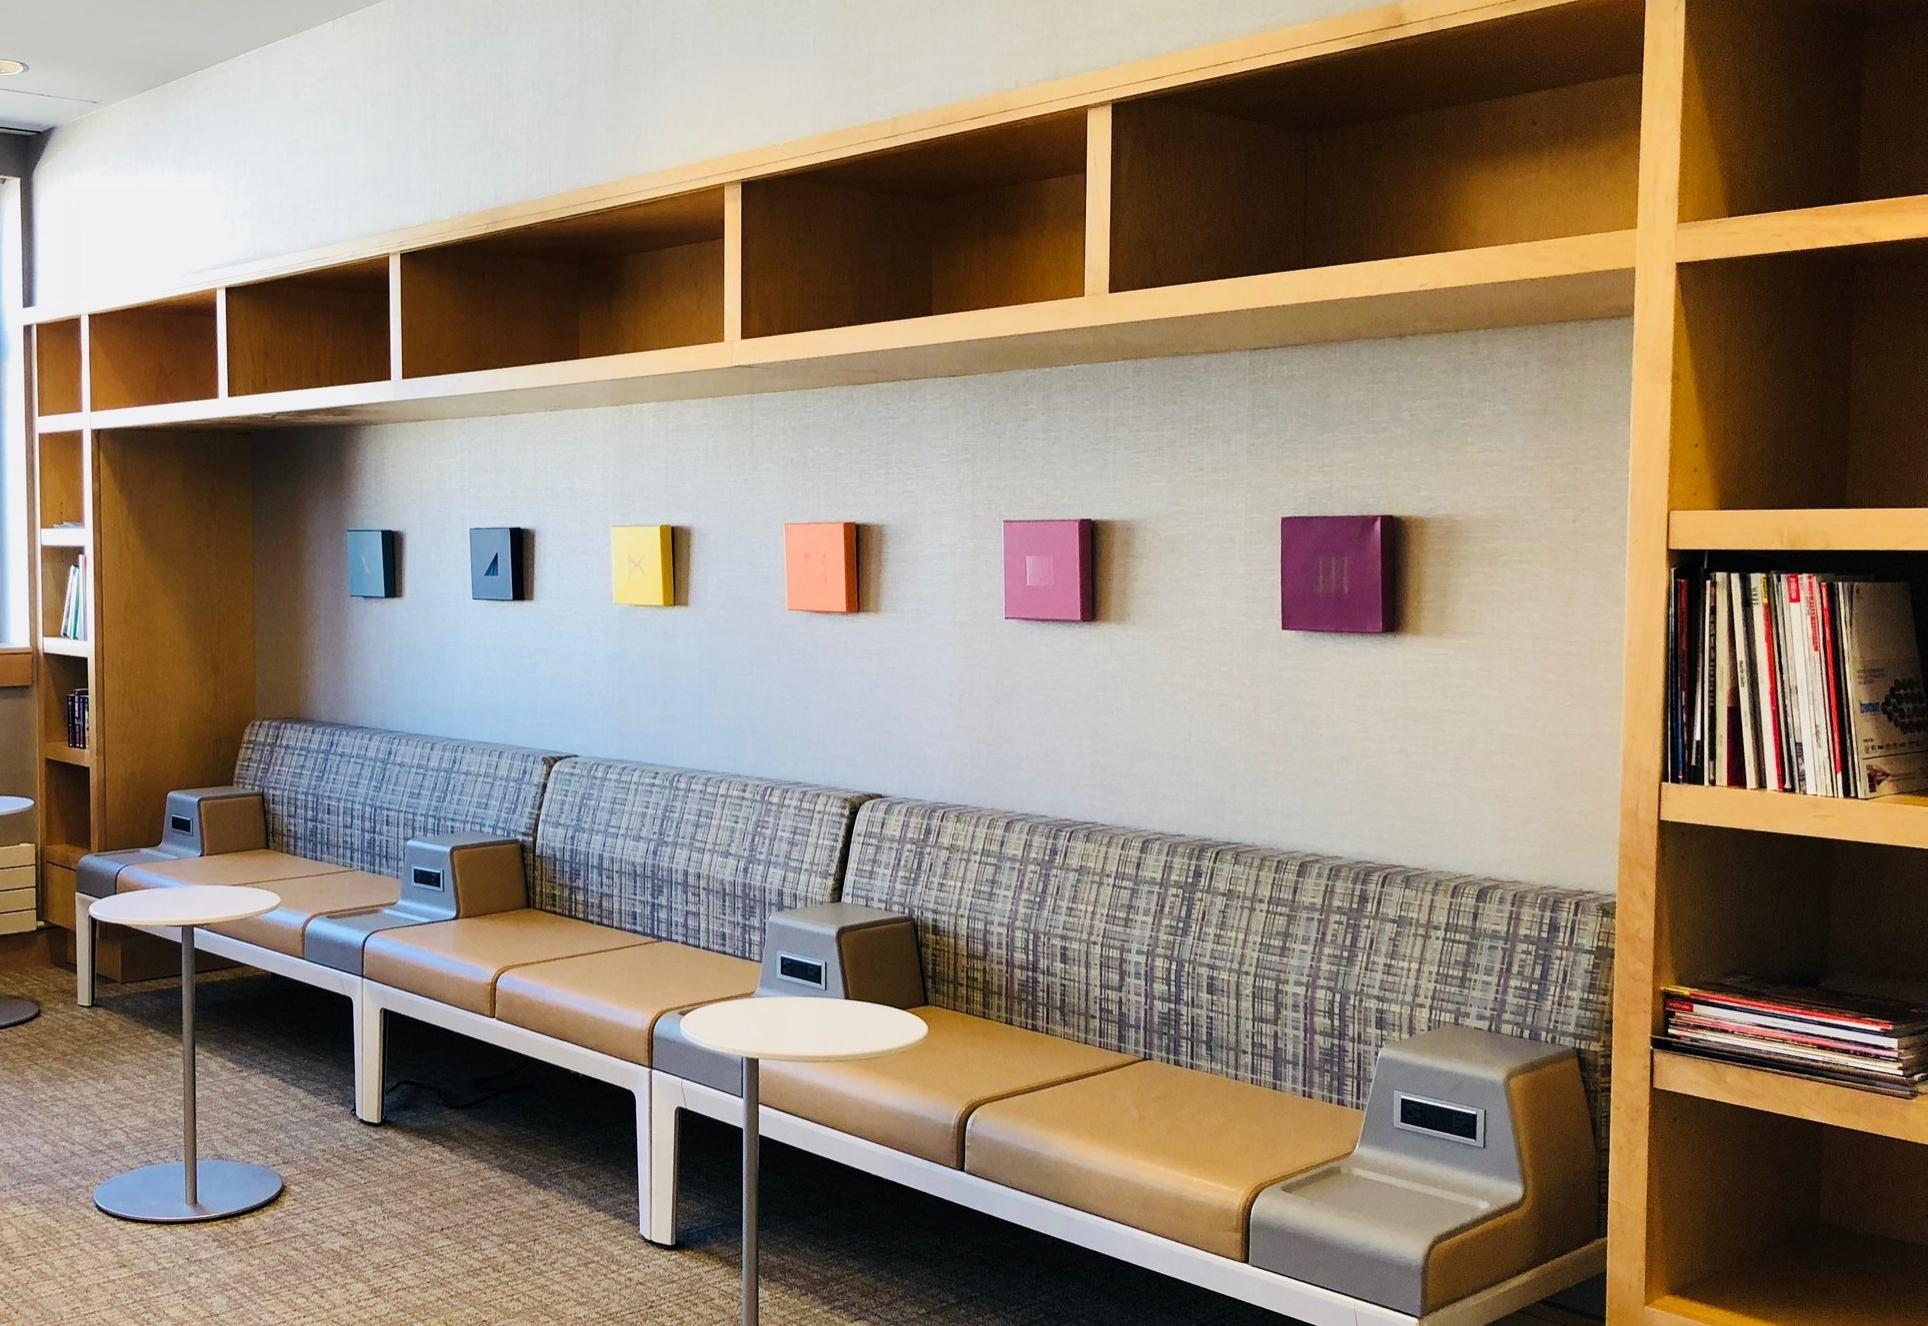 Installation View: Maggie Avolio, Thread Drawing Series, 2017-18